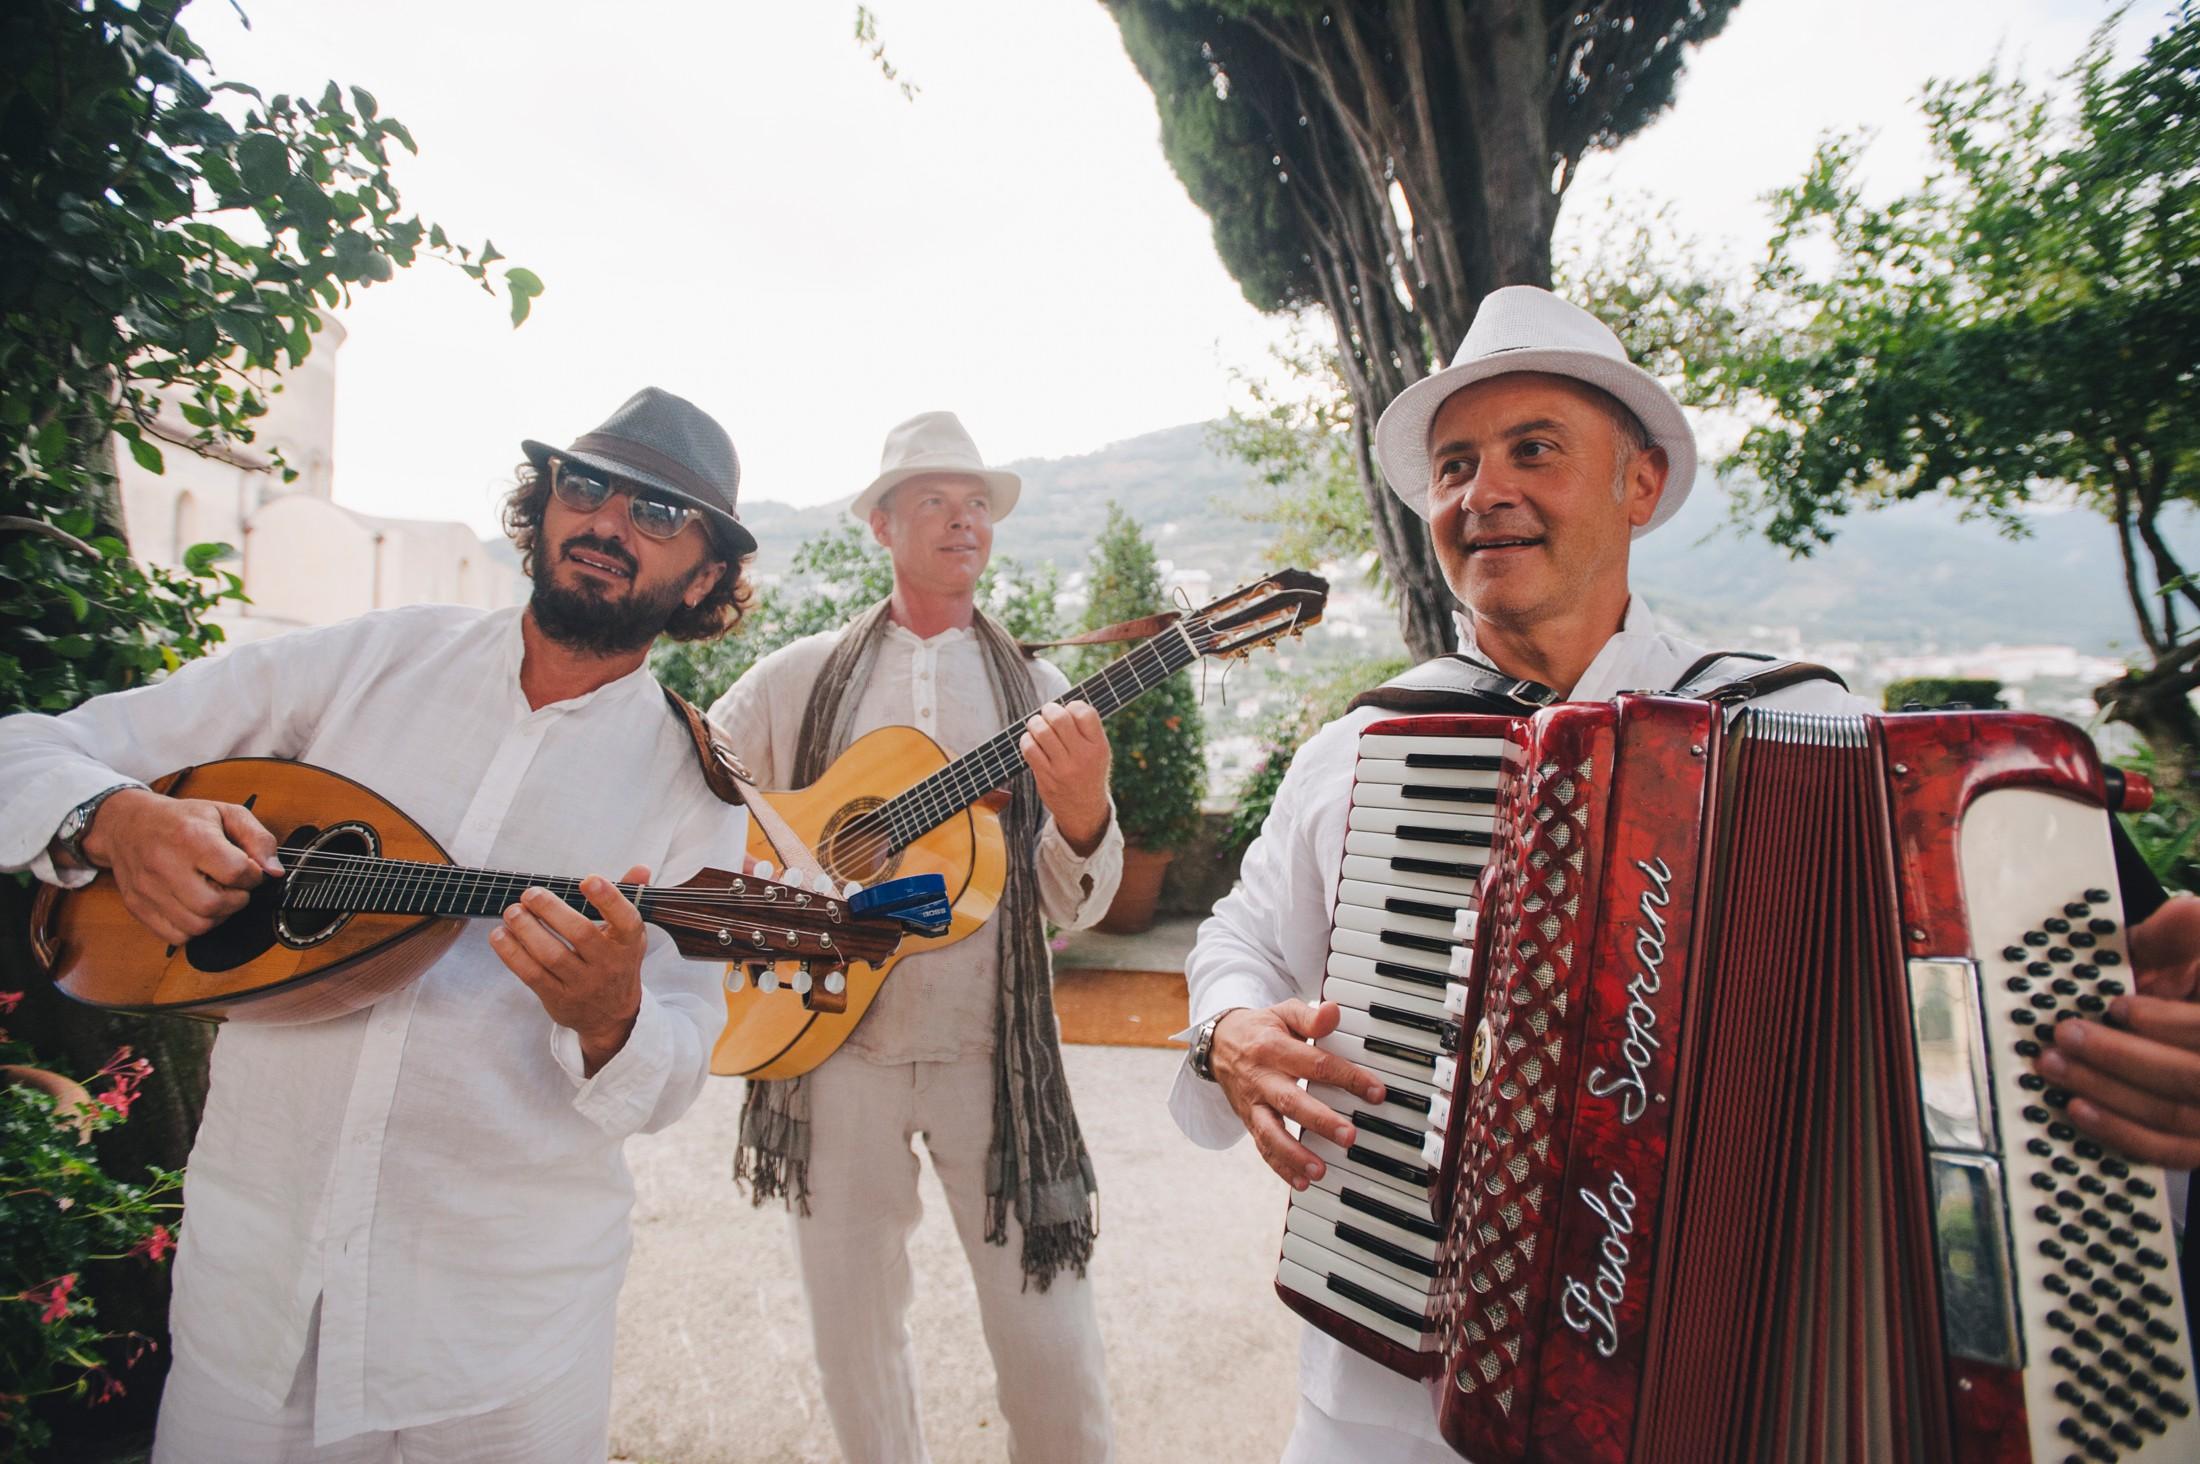 traditional Italian wedding music band